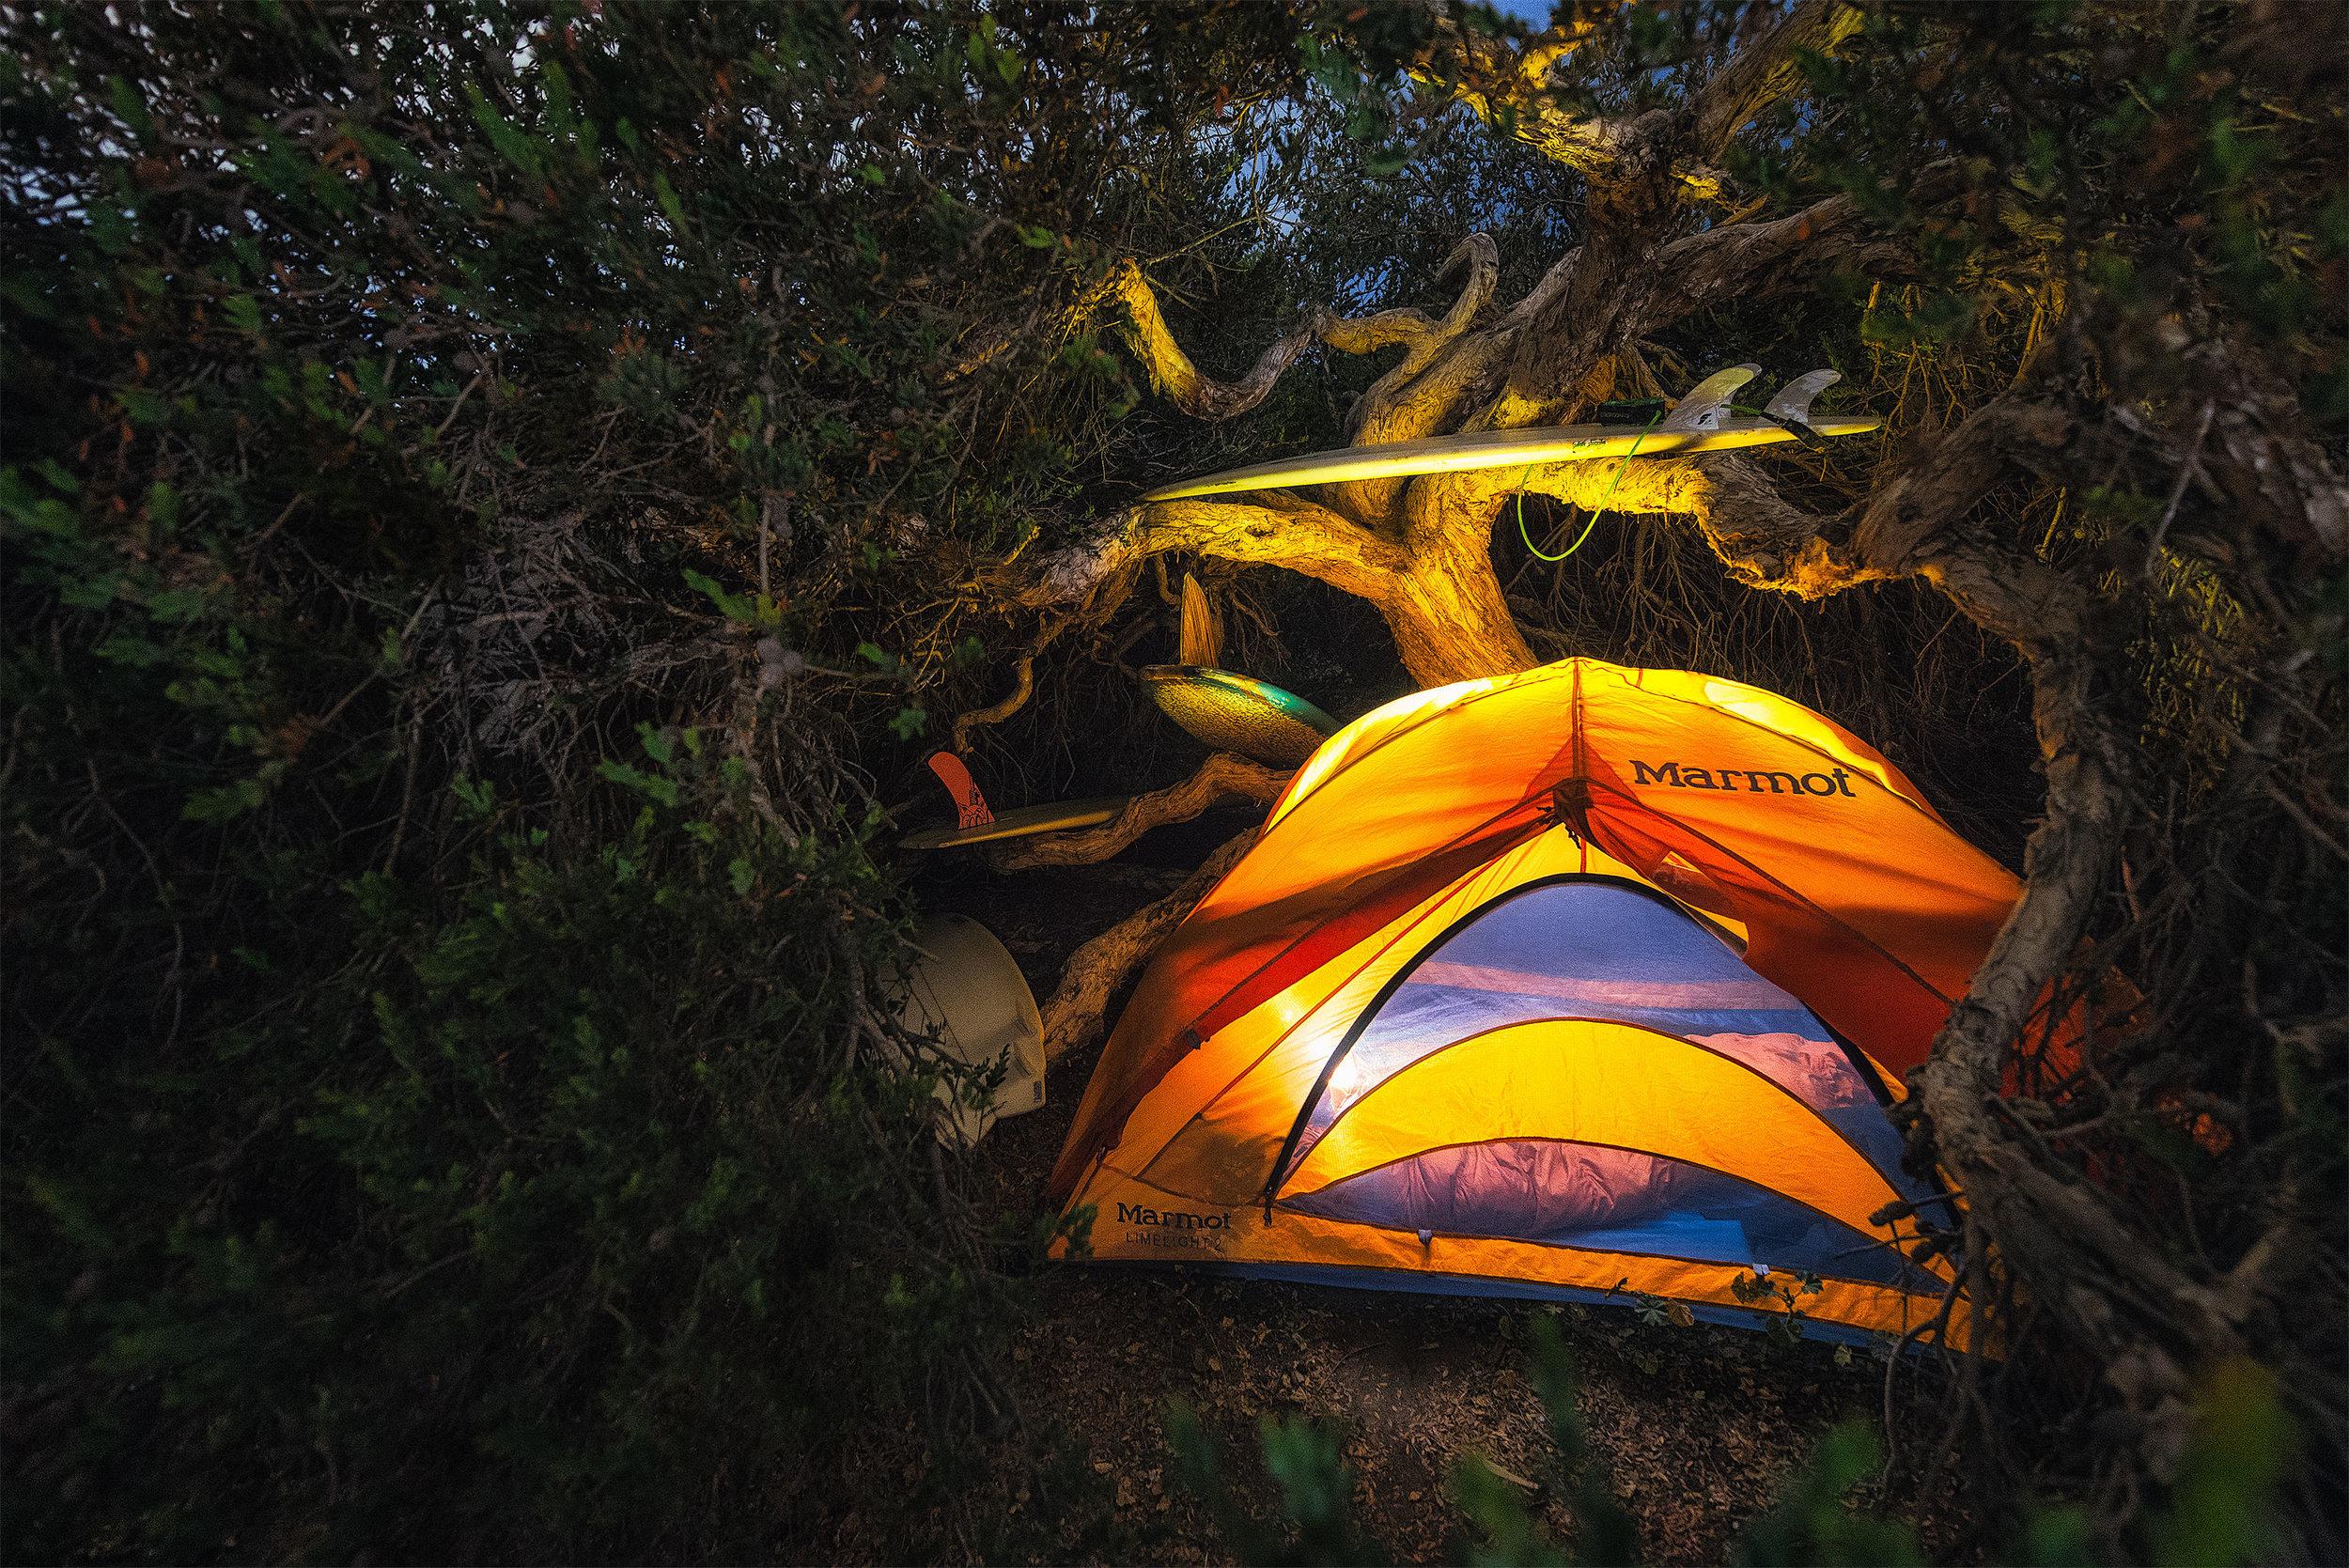 austin-trigg-southern-california-San-onofre-camping-surfboard-tree.jpg